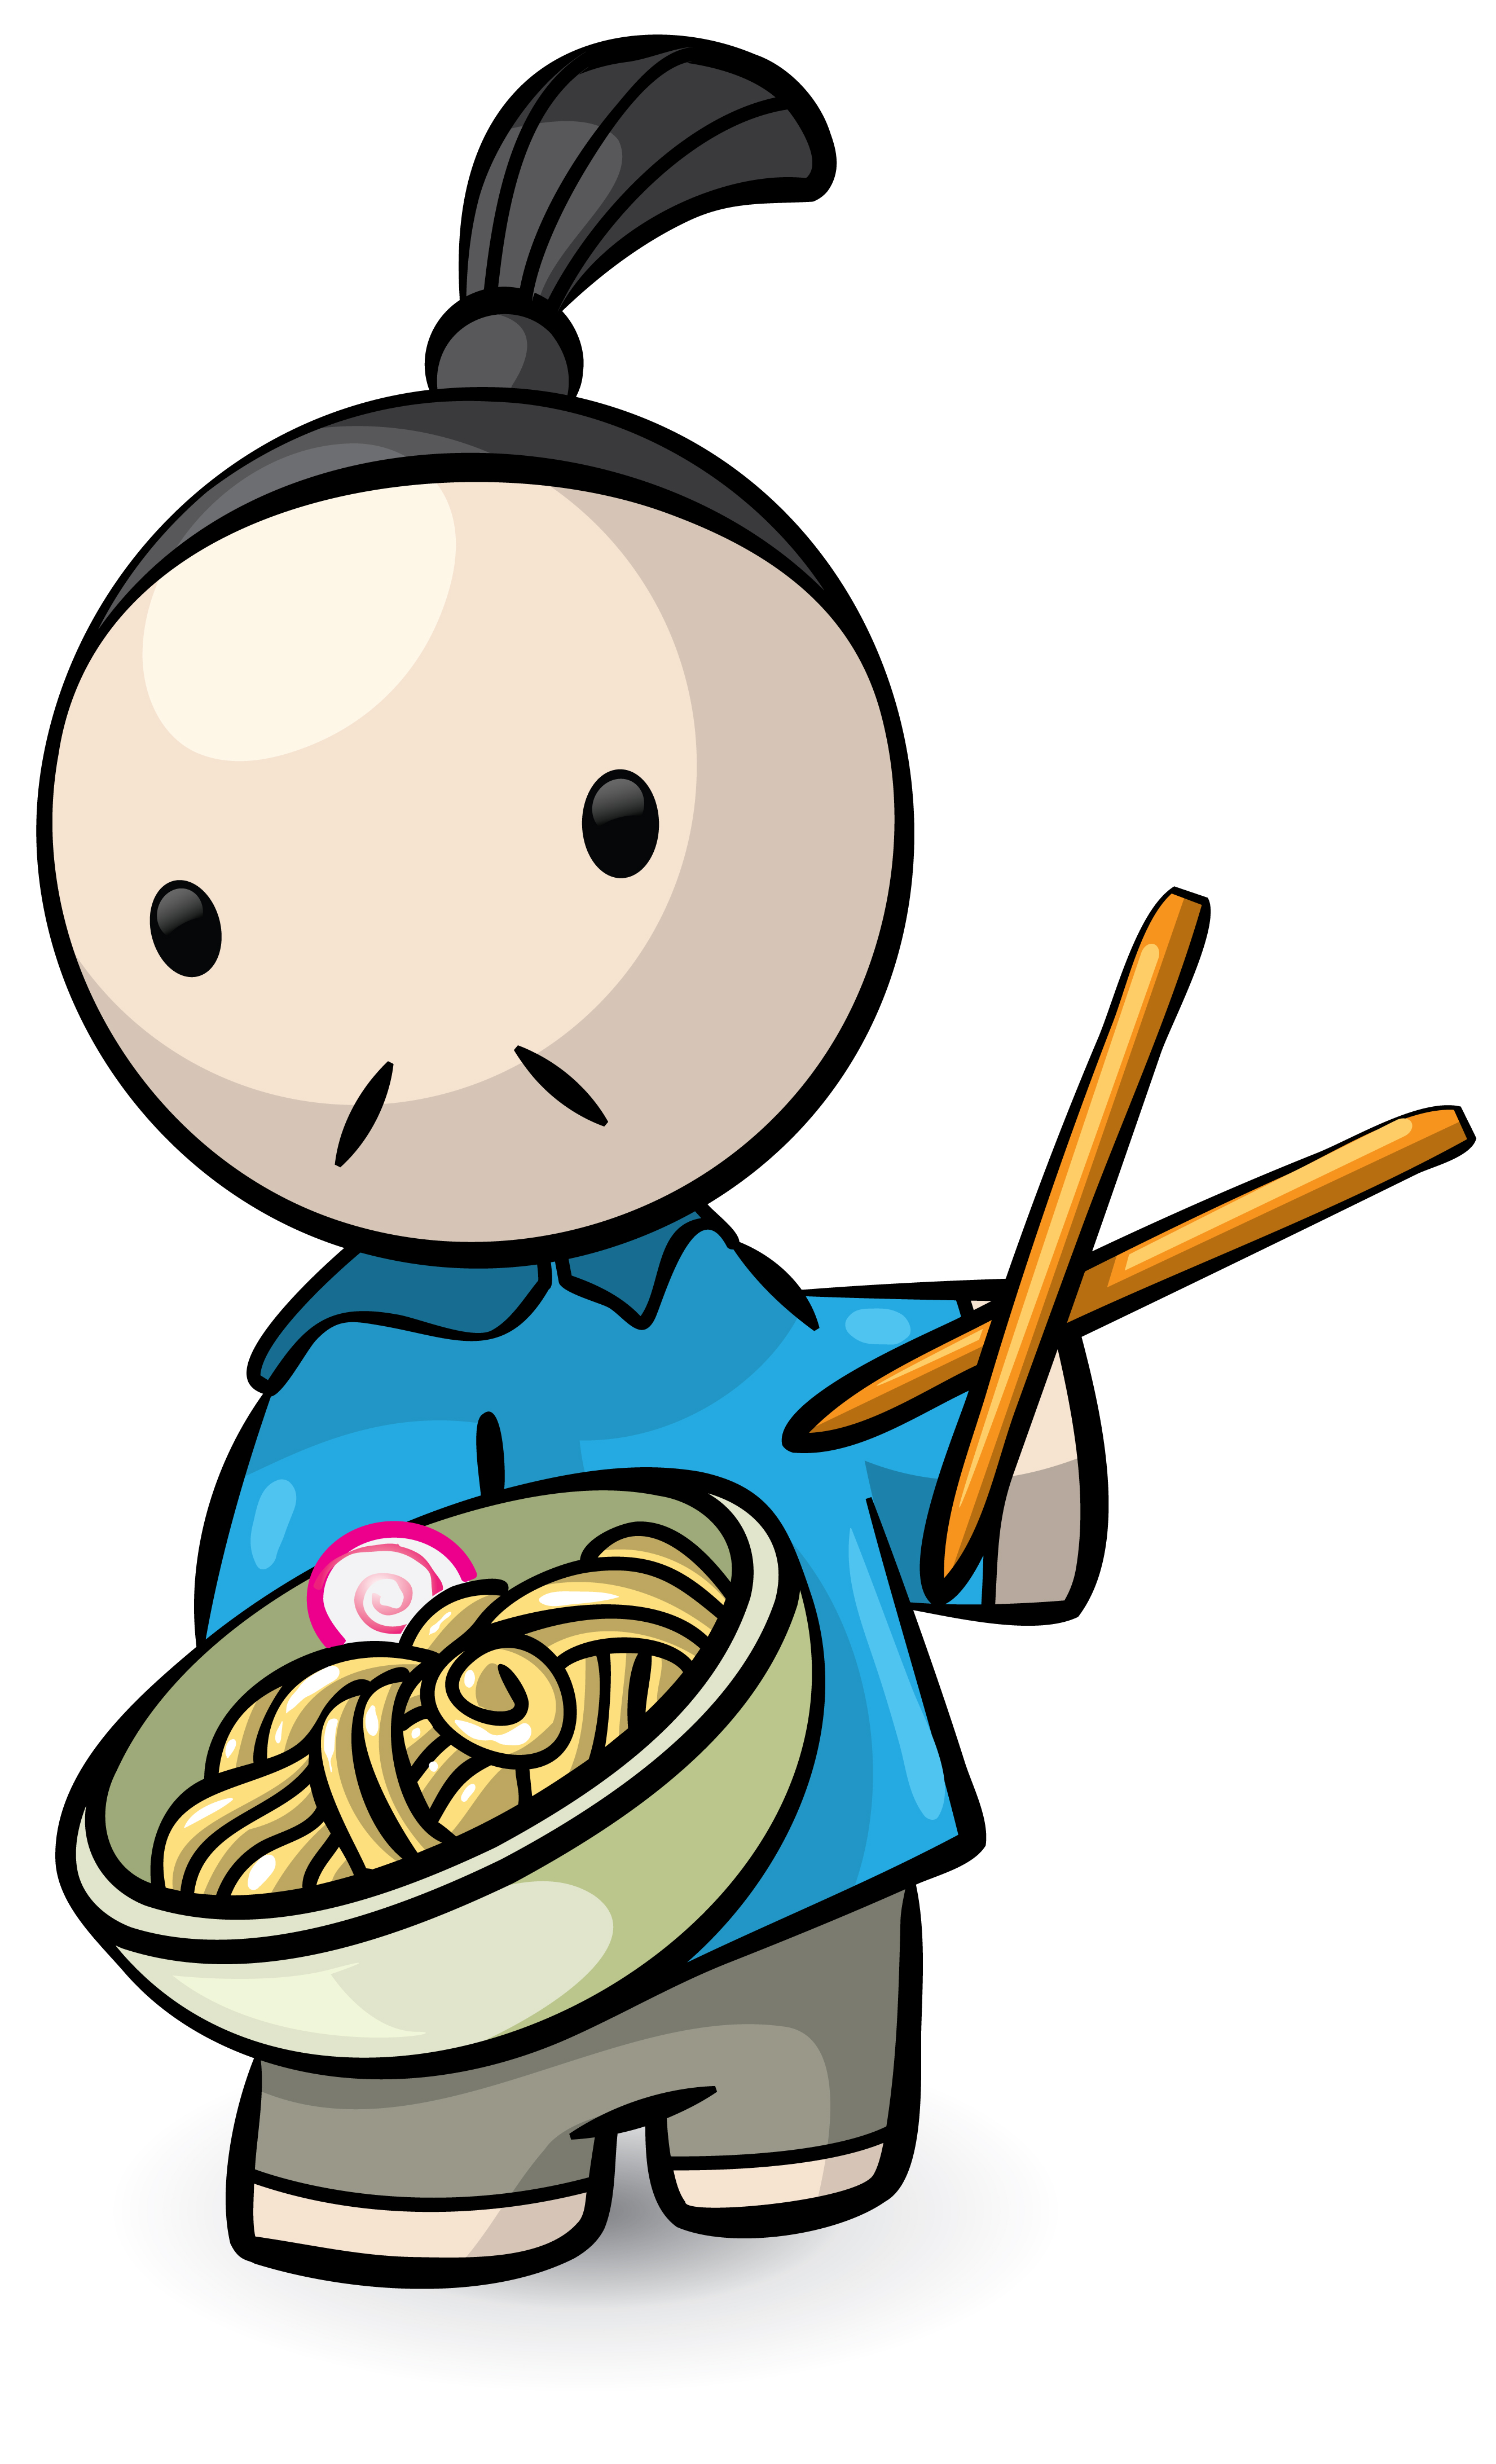 Asian Food Clip Art - ClipArt Best (2652 x 4368 Pixel)